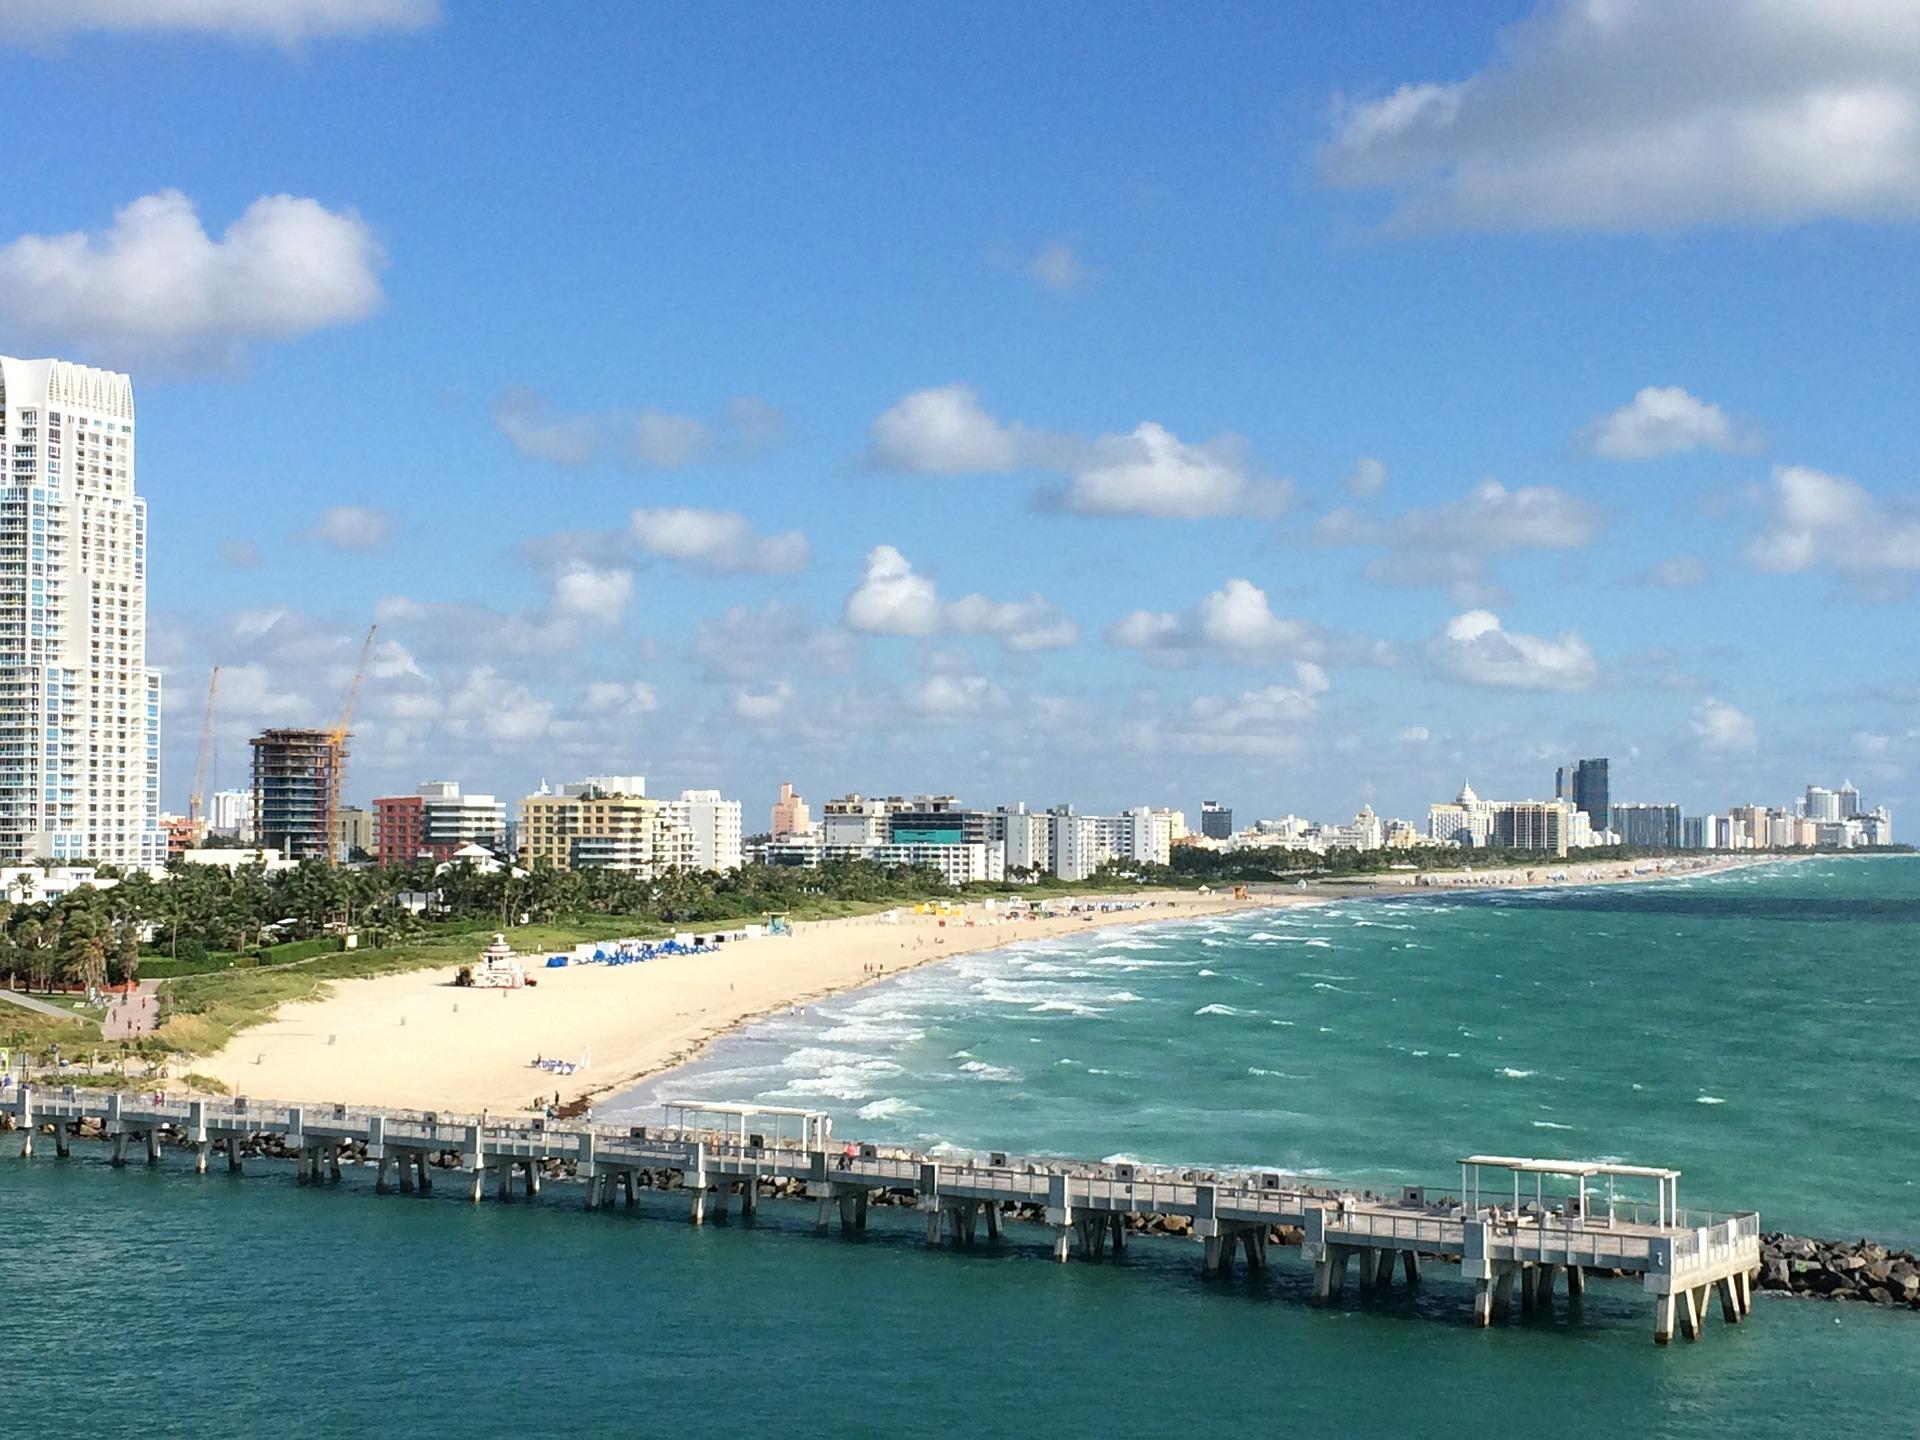 Der berühmte Miami Beach